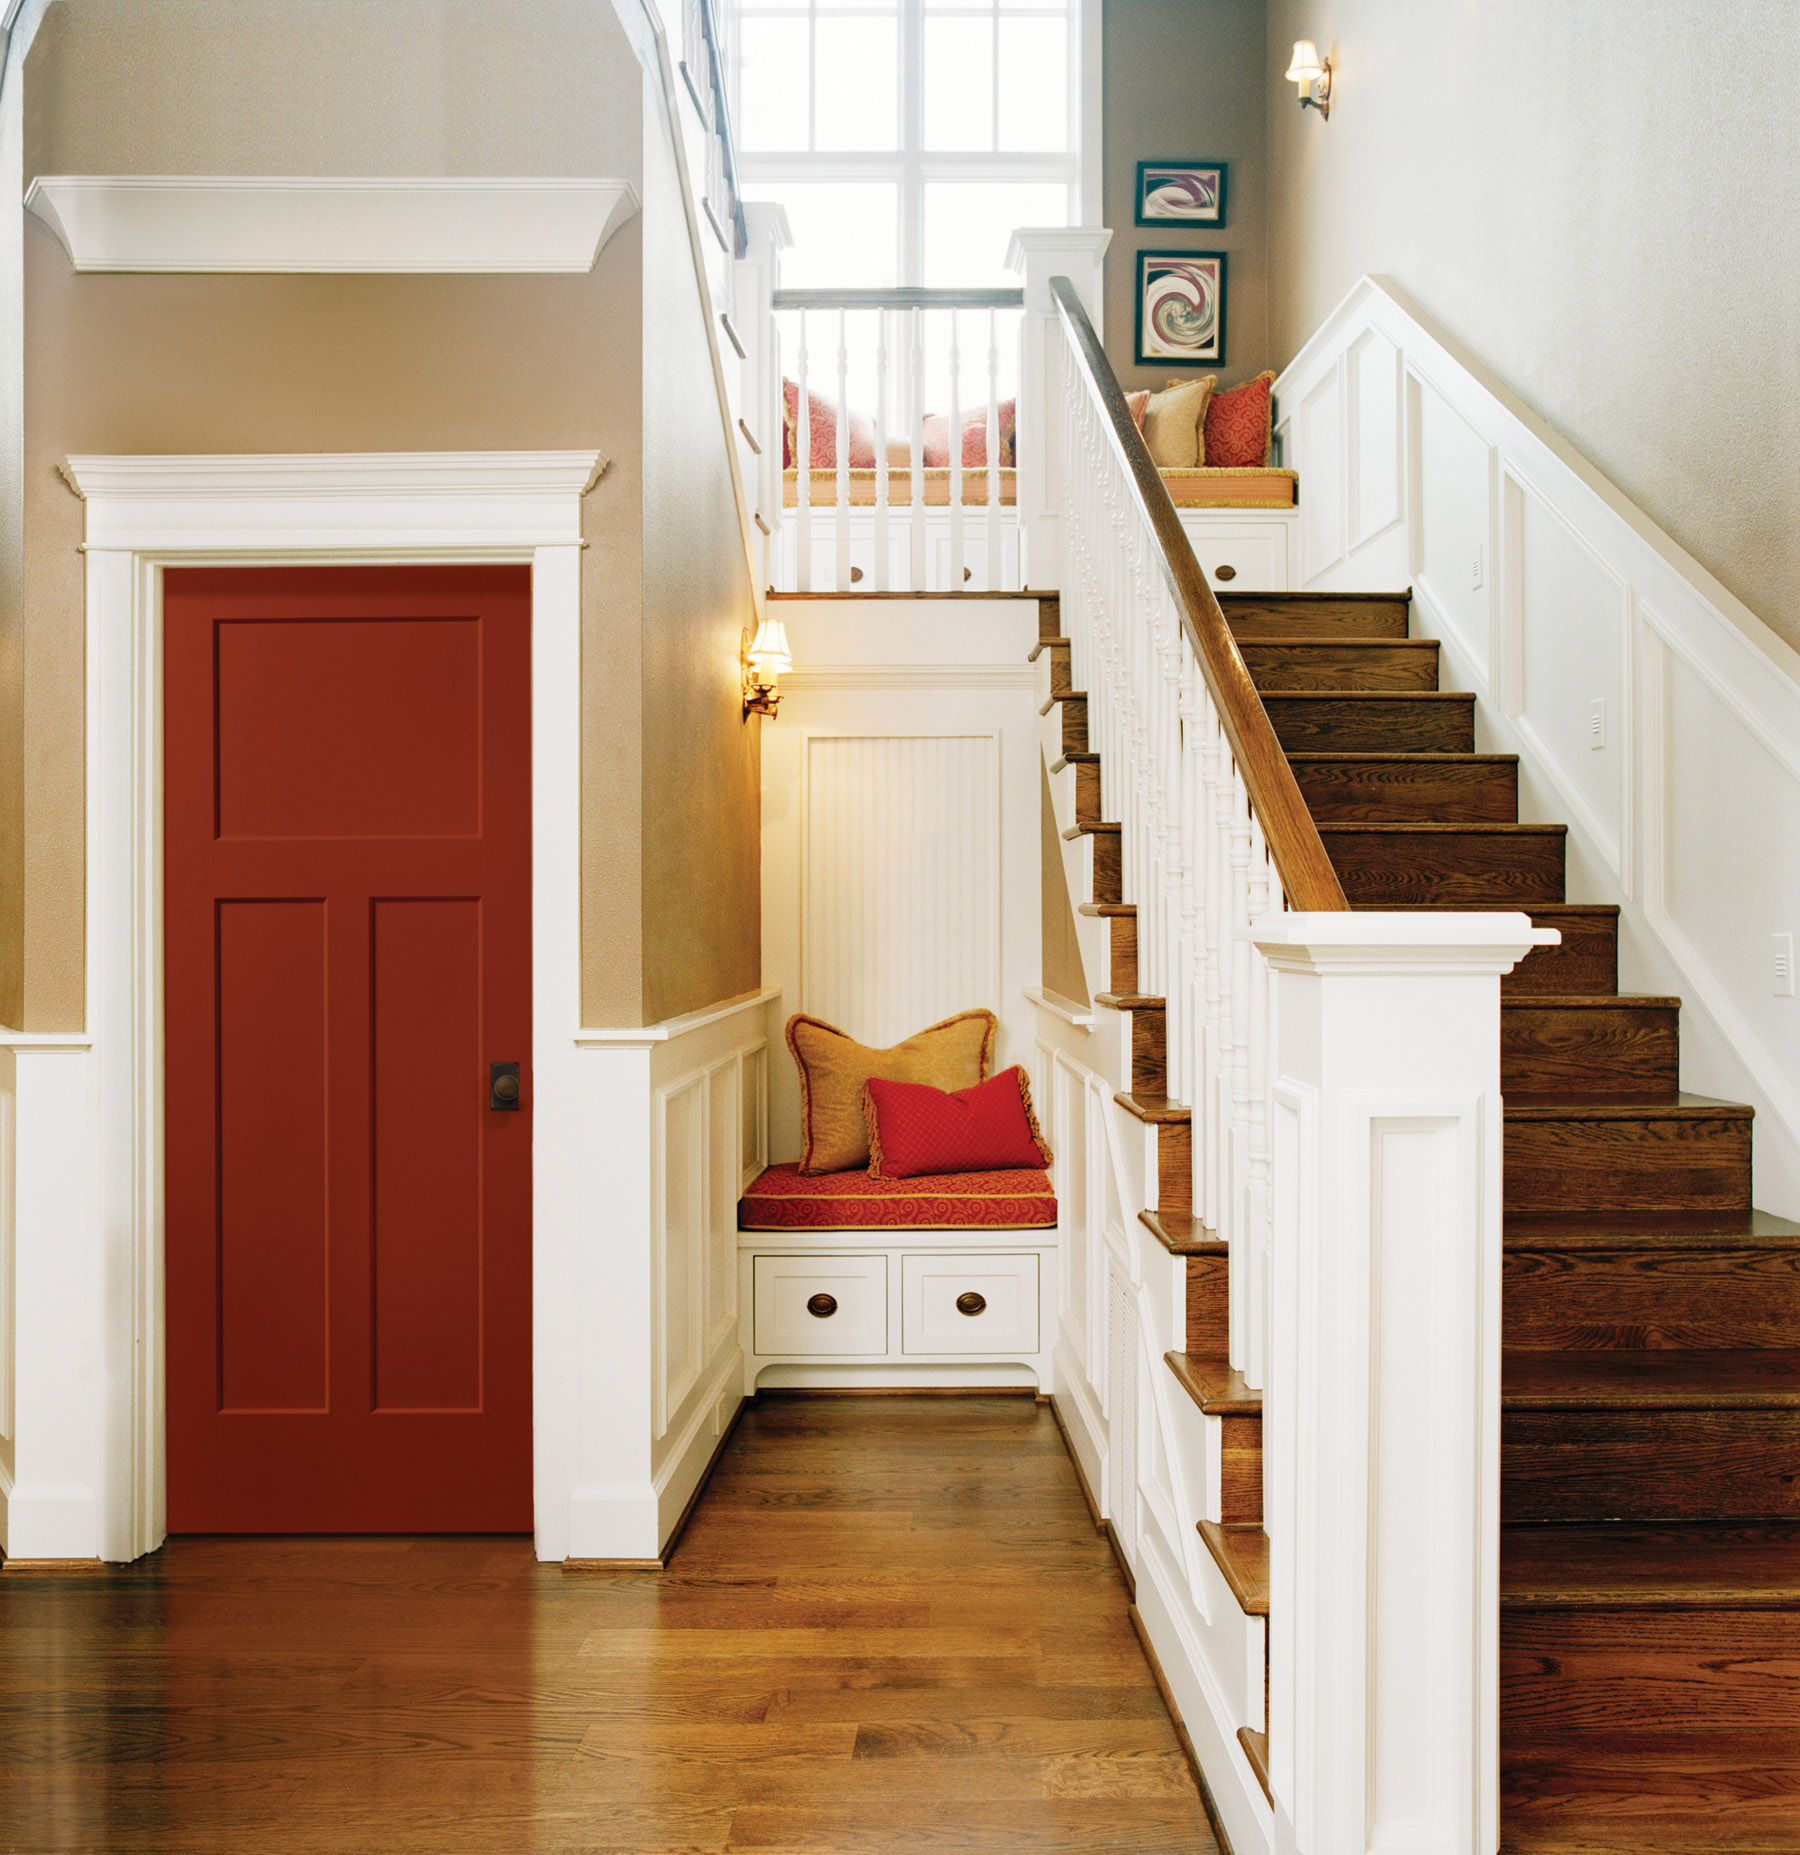 Classic Lines Highlight Masoniteu0027s Heritage Series Interior Doors | JLC  Online | Doors, Interiors, Masonite